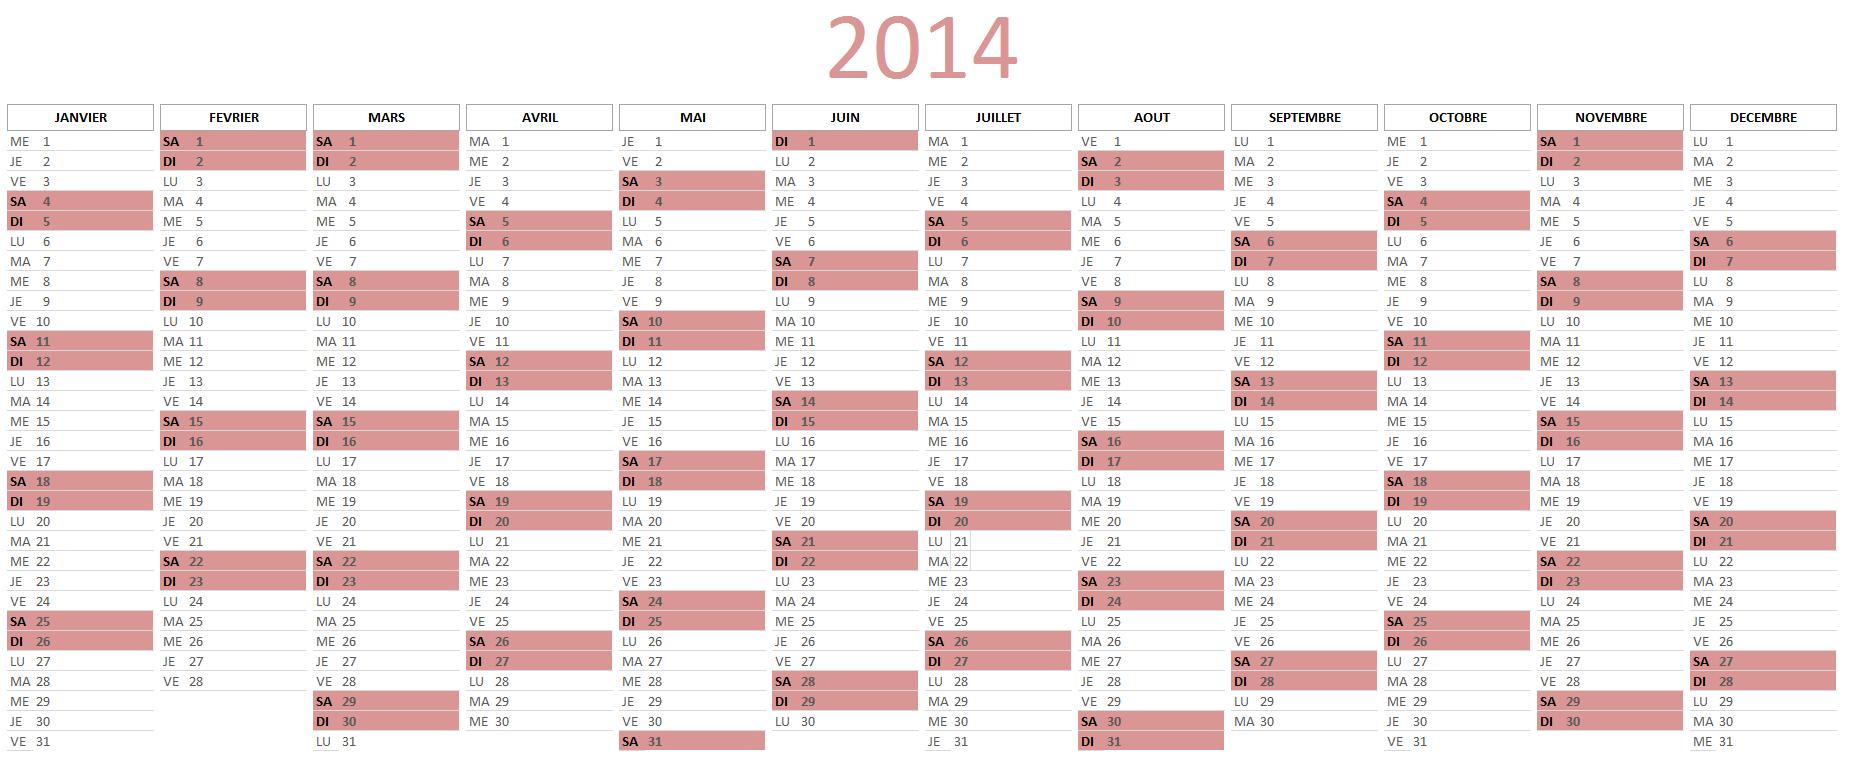 Calendrier 2014 excel tlcharger gratuitement calendrier 2014 excel ccuart Choice Image